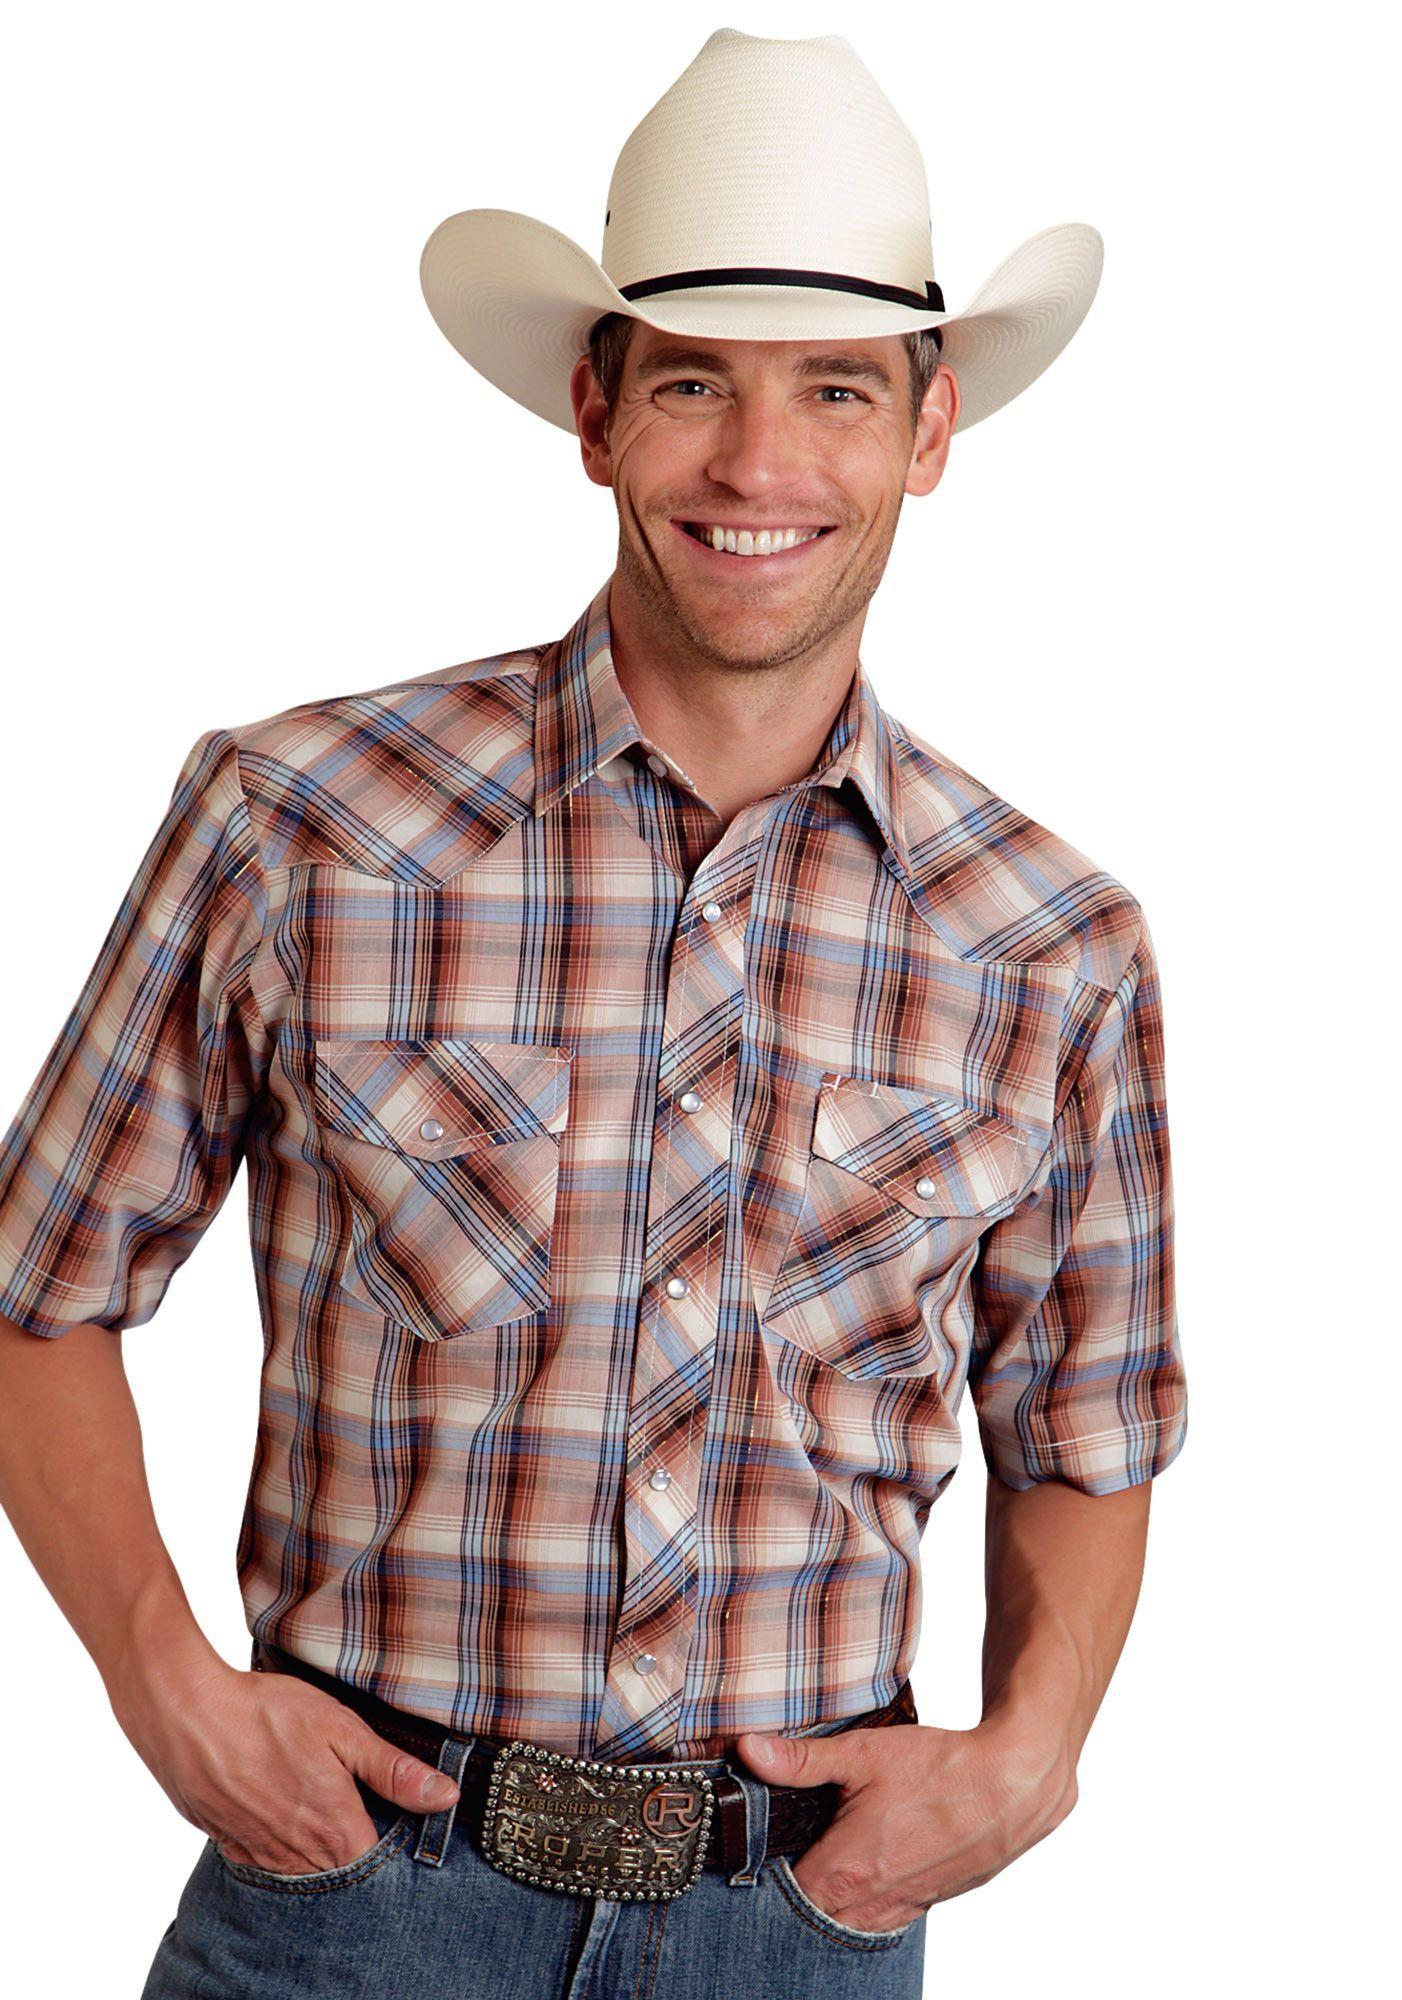 Roper Mens 9742 Multi Brown Plaid W/ Lurex Poly Cotton 55/45 Plaids Short Sleeve Shirt Snap Closure - 2 Pocket